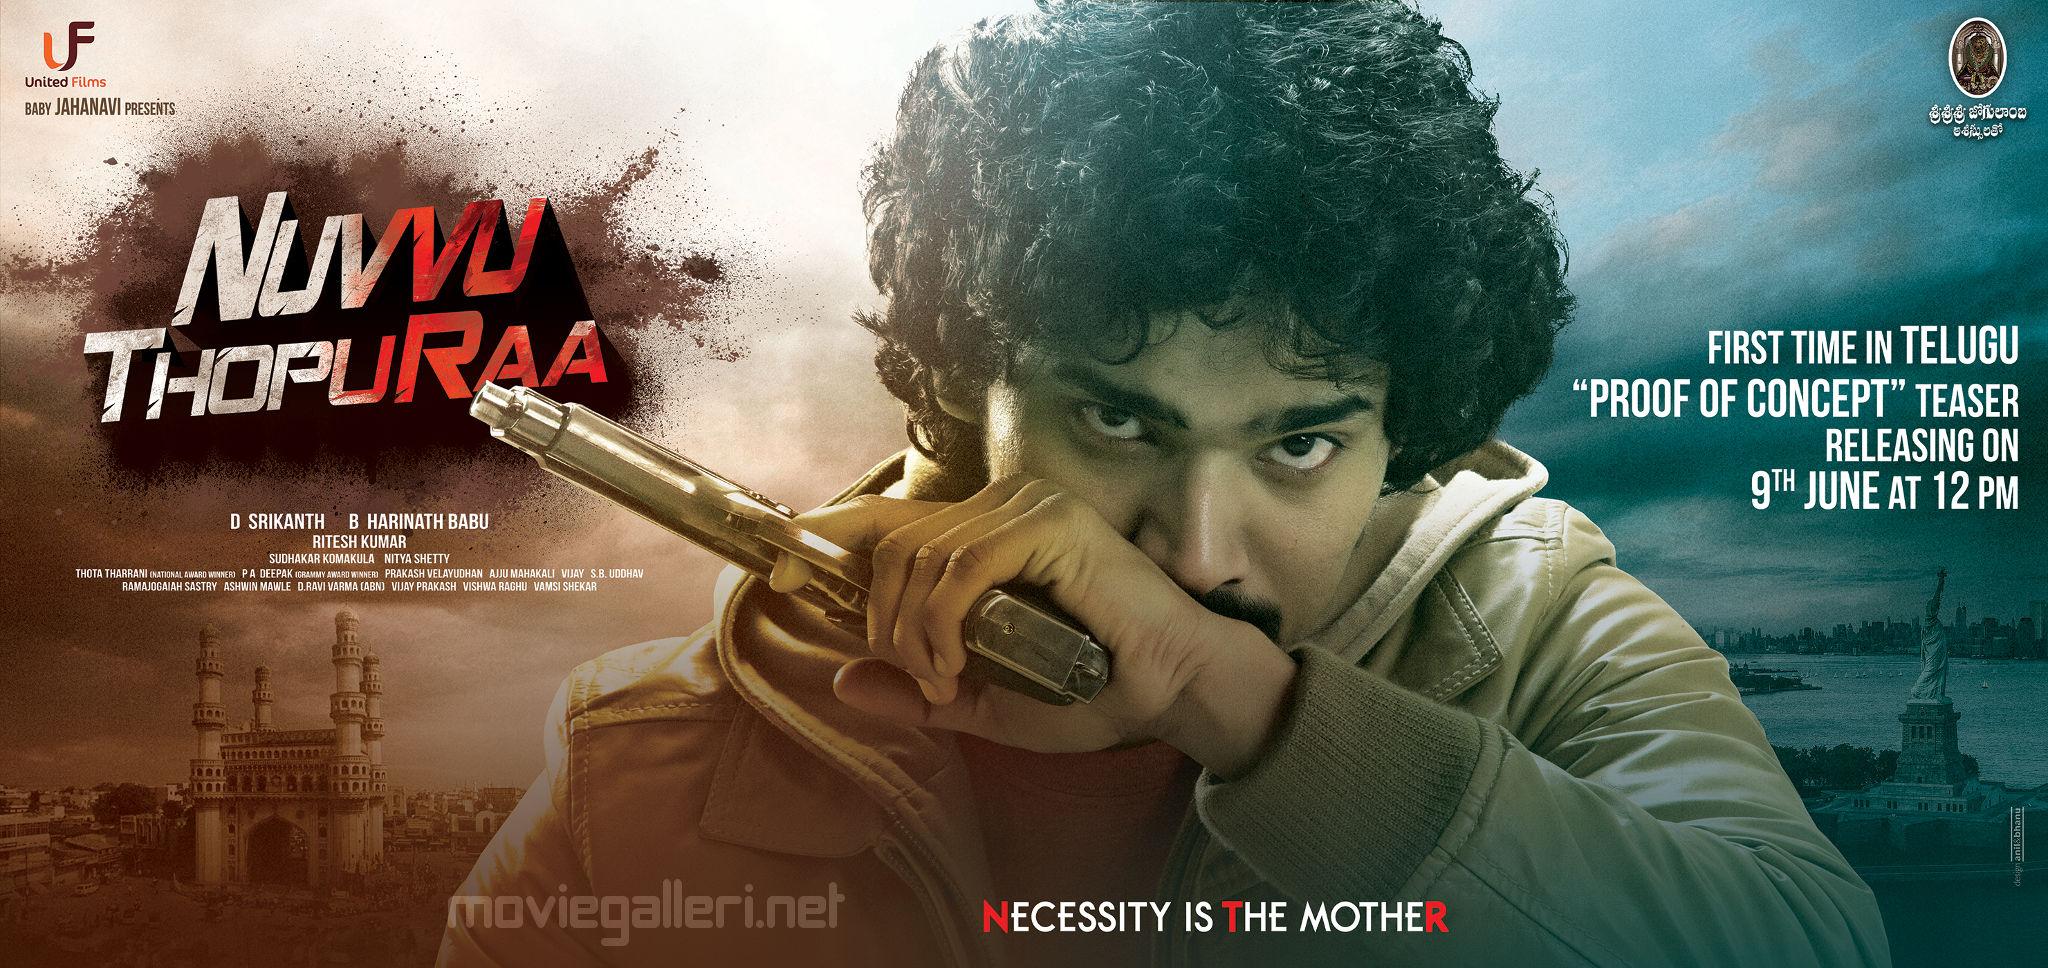 Sudhakar Komakula's Nuvvu Thopu Raa Teaser Releasing on June 9th Wallpaper